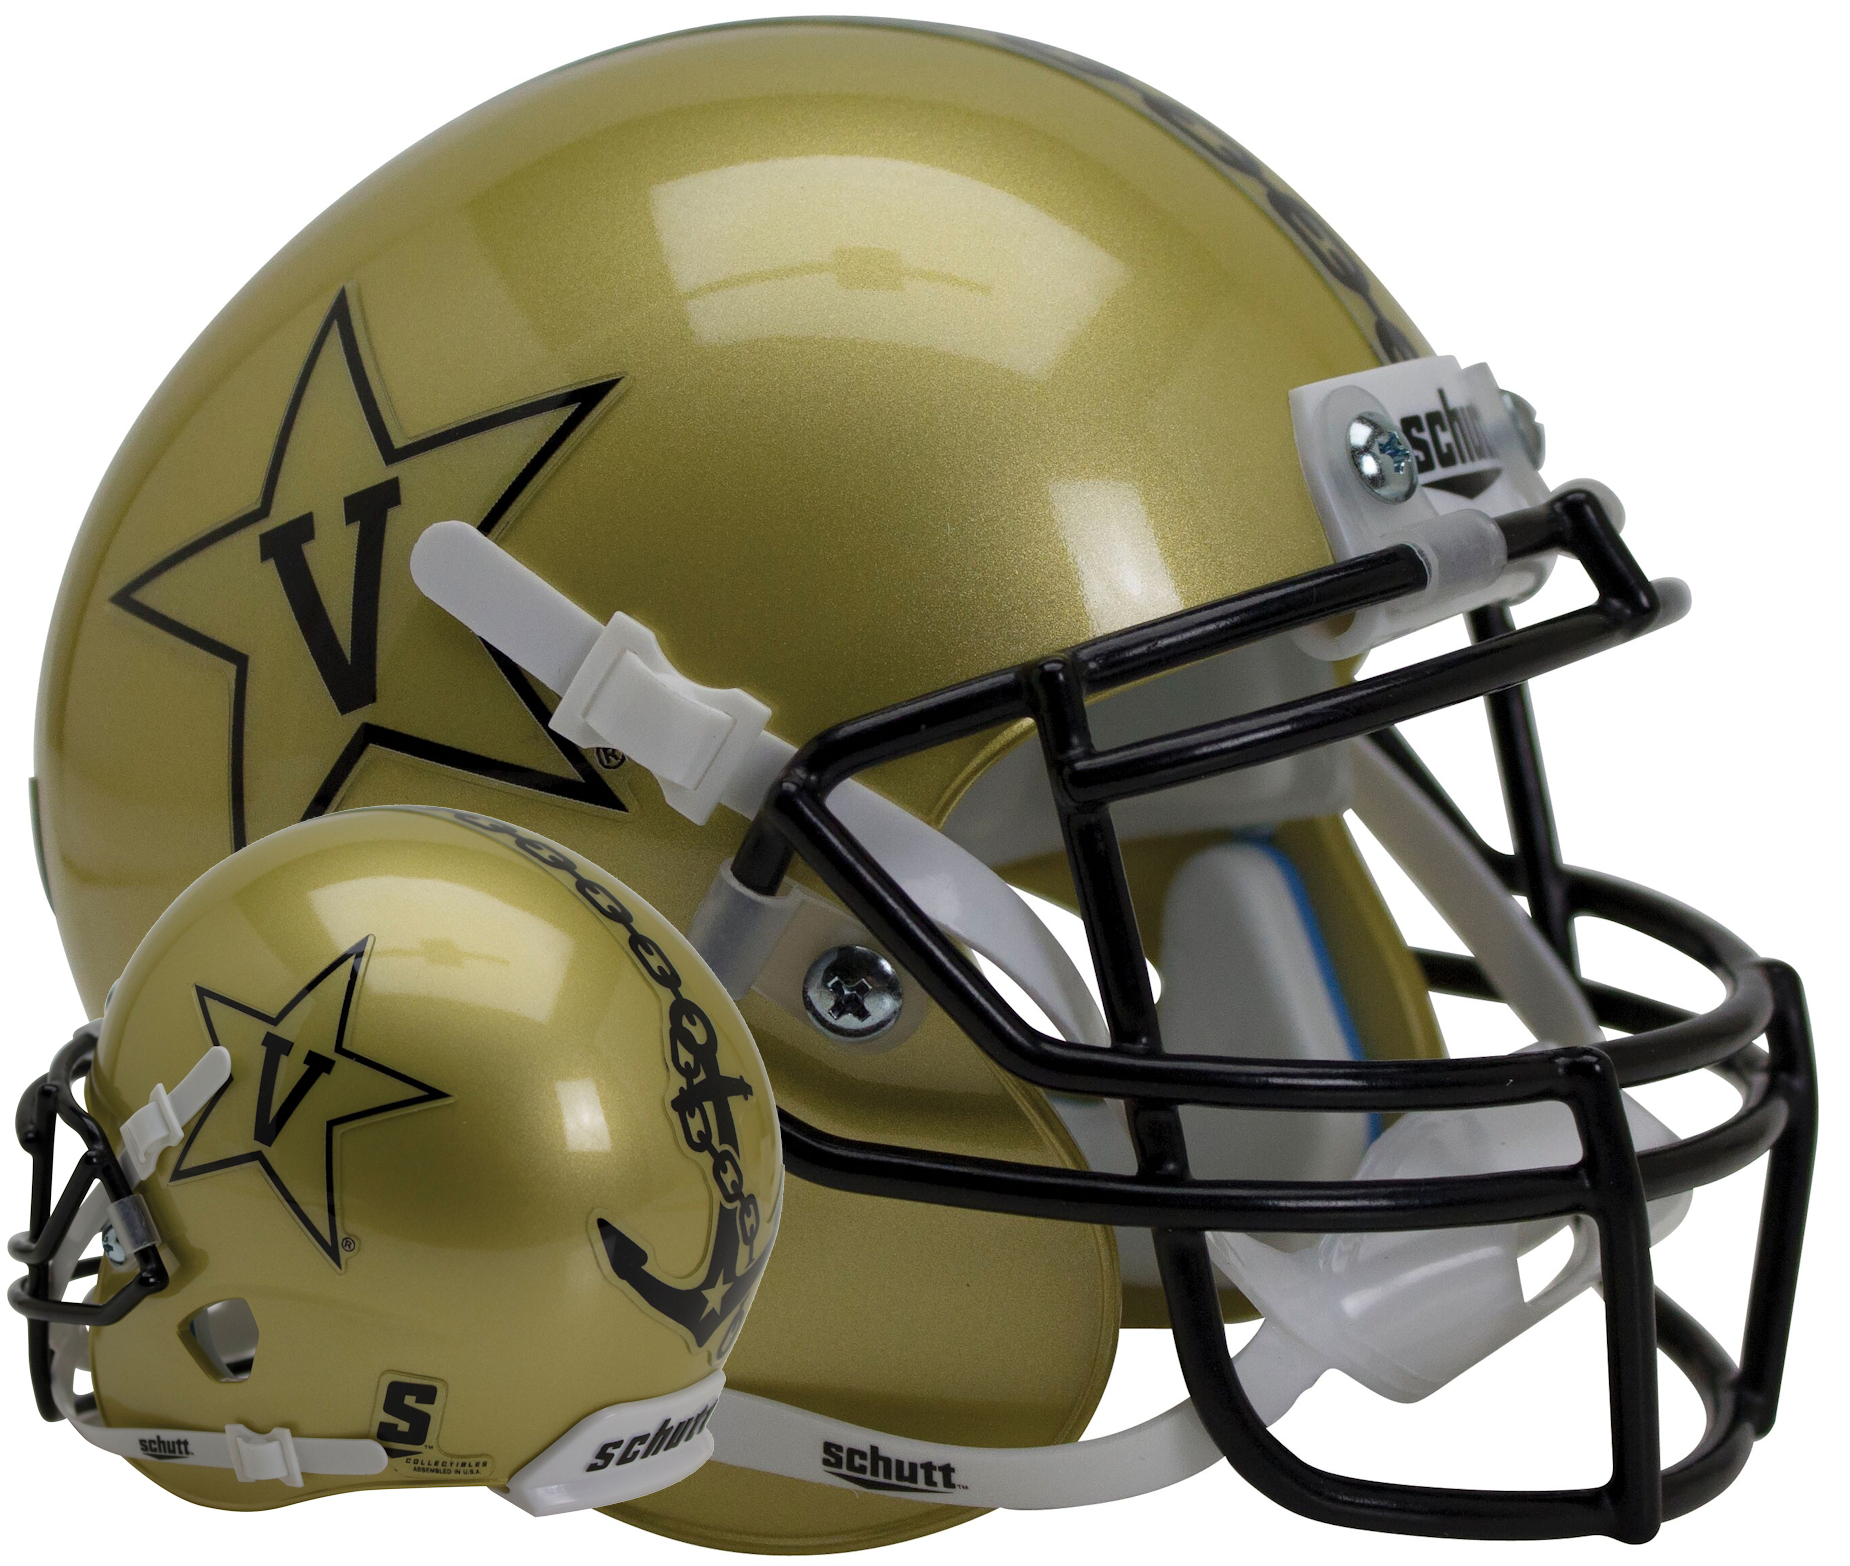 Vanderbilt Commodores Authentic College XP Football Helmet Schutt <B>Gold</B>